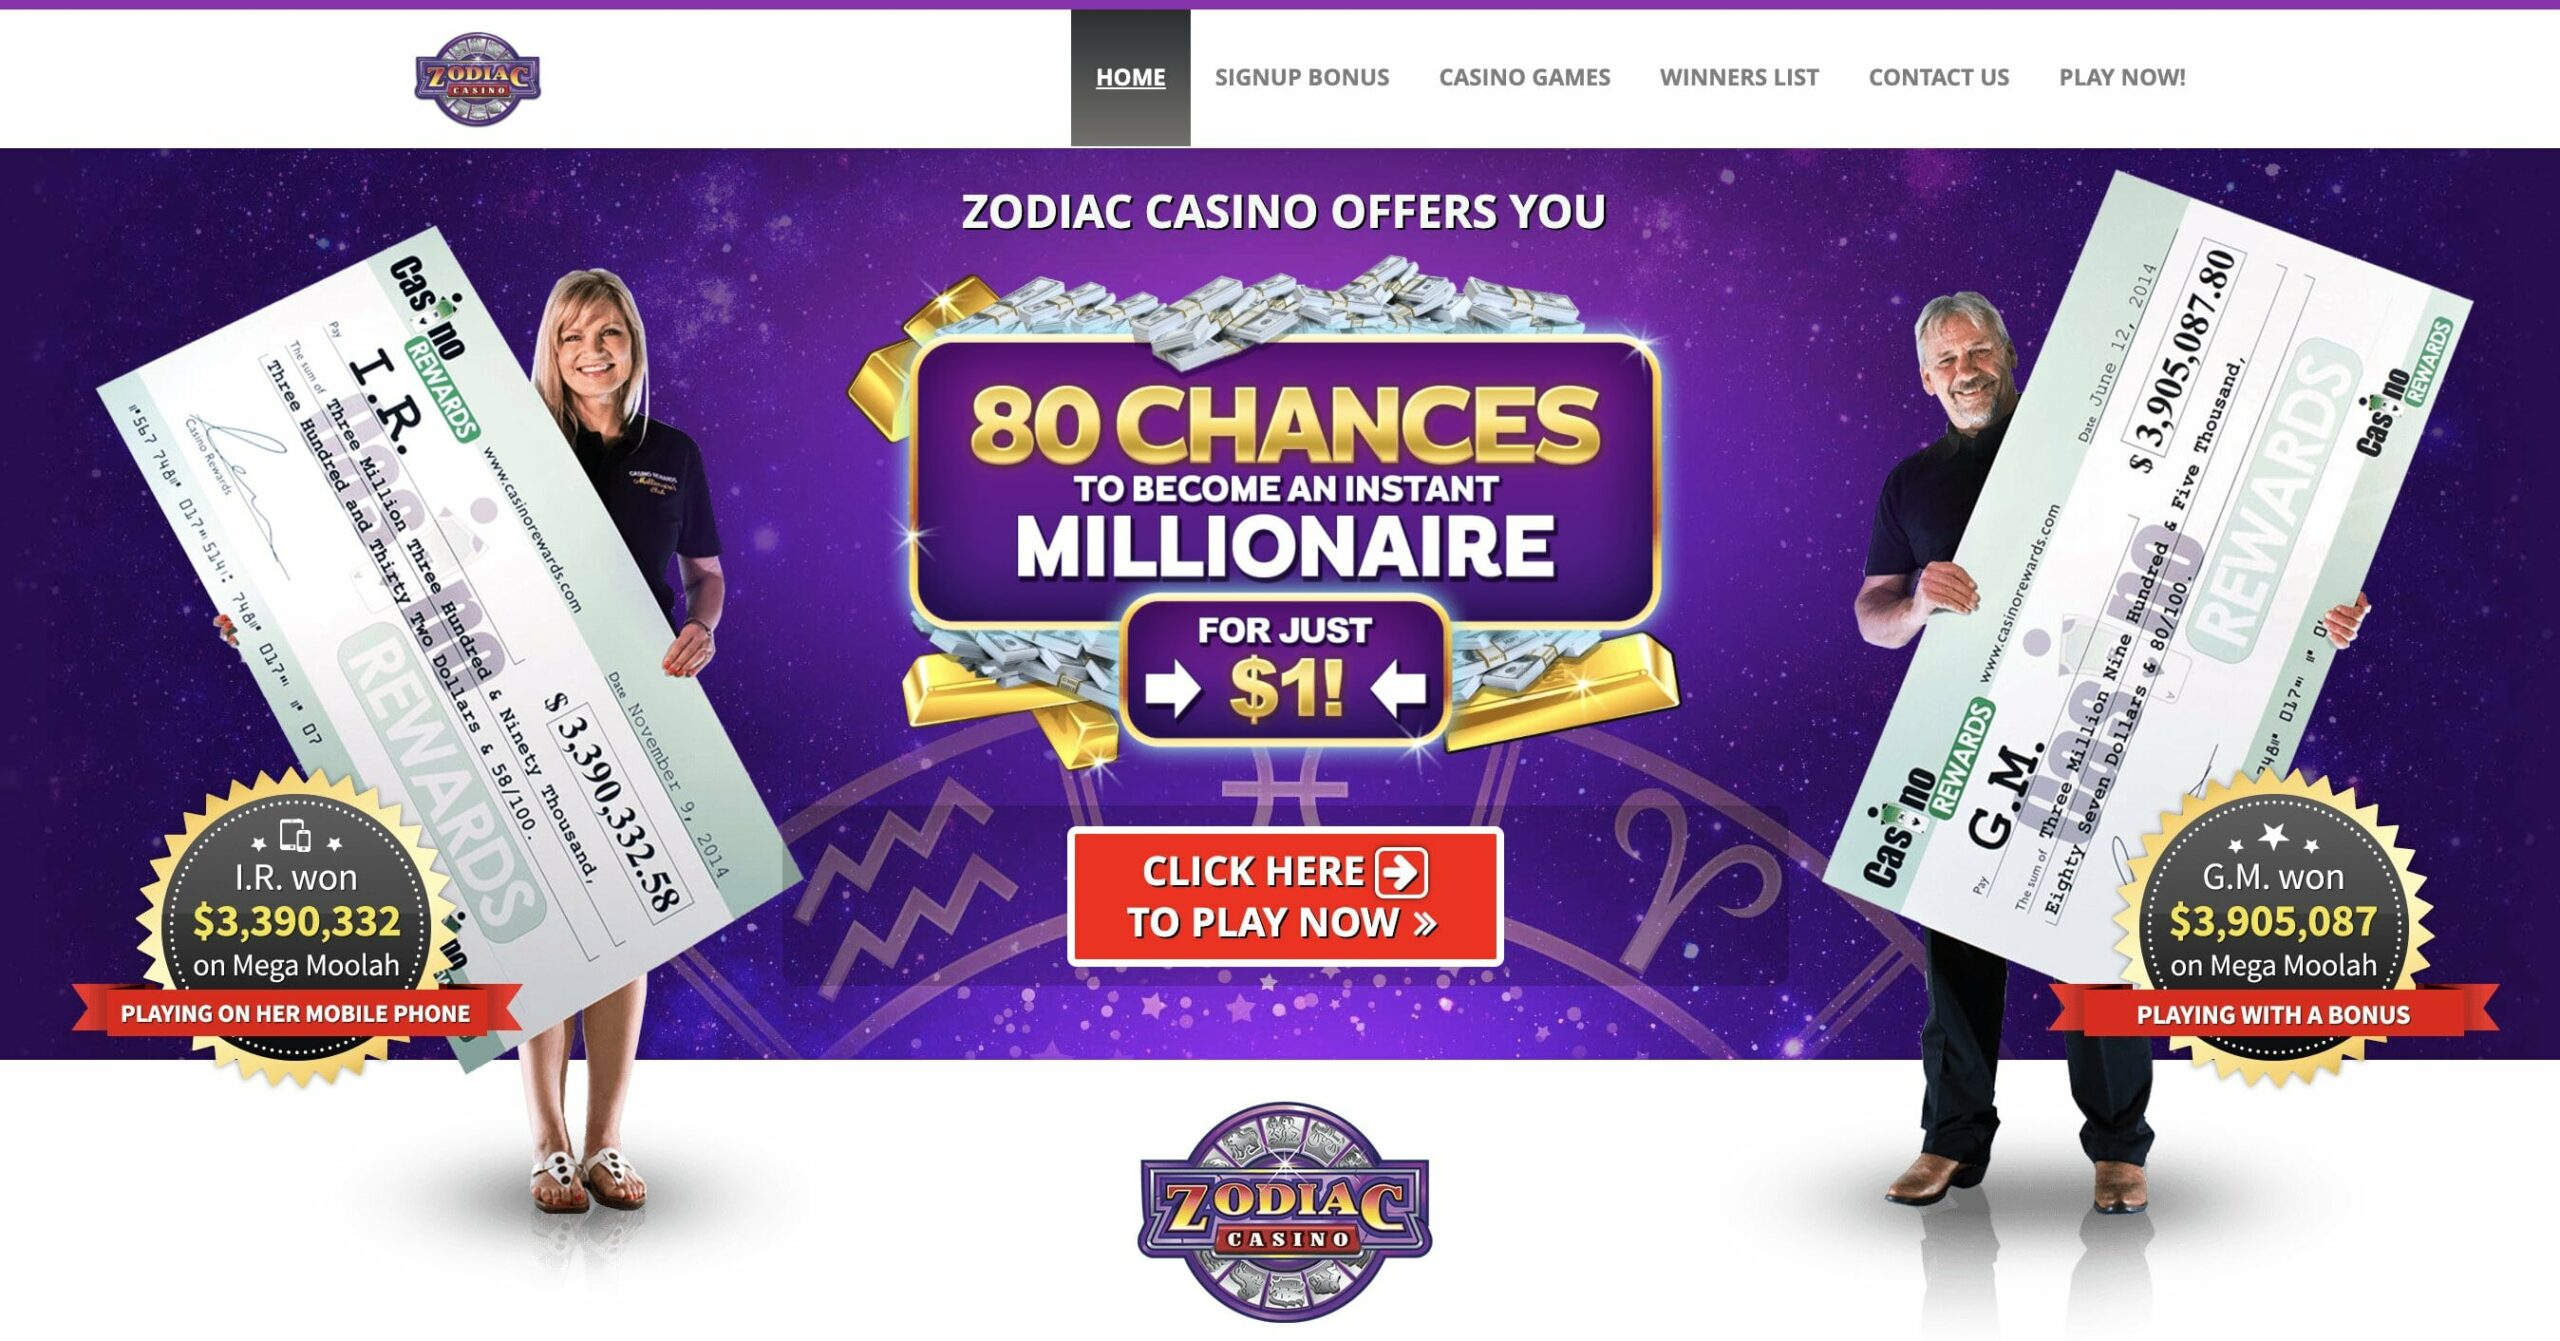 Zodiac Casino Canada Online